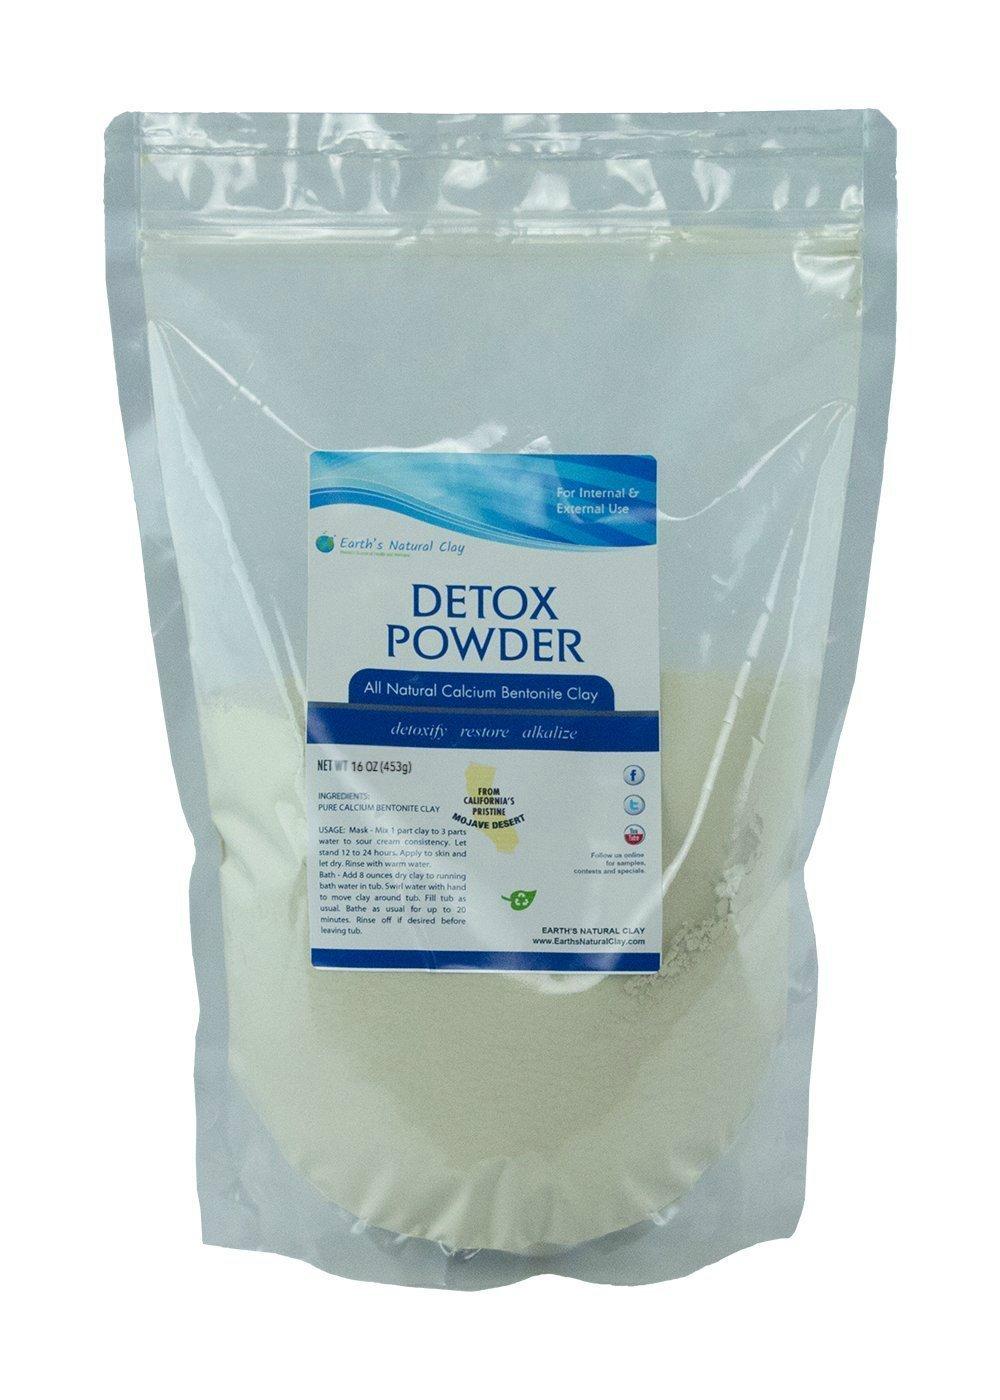 Earth's Living Calcium Bentonite Montmorillonite Powder, Pharmaceutical, Food Grade for Internal and External Use, Detox Colon Cleanse, Face Mask, 1 lb., 16 oz.